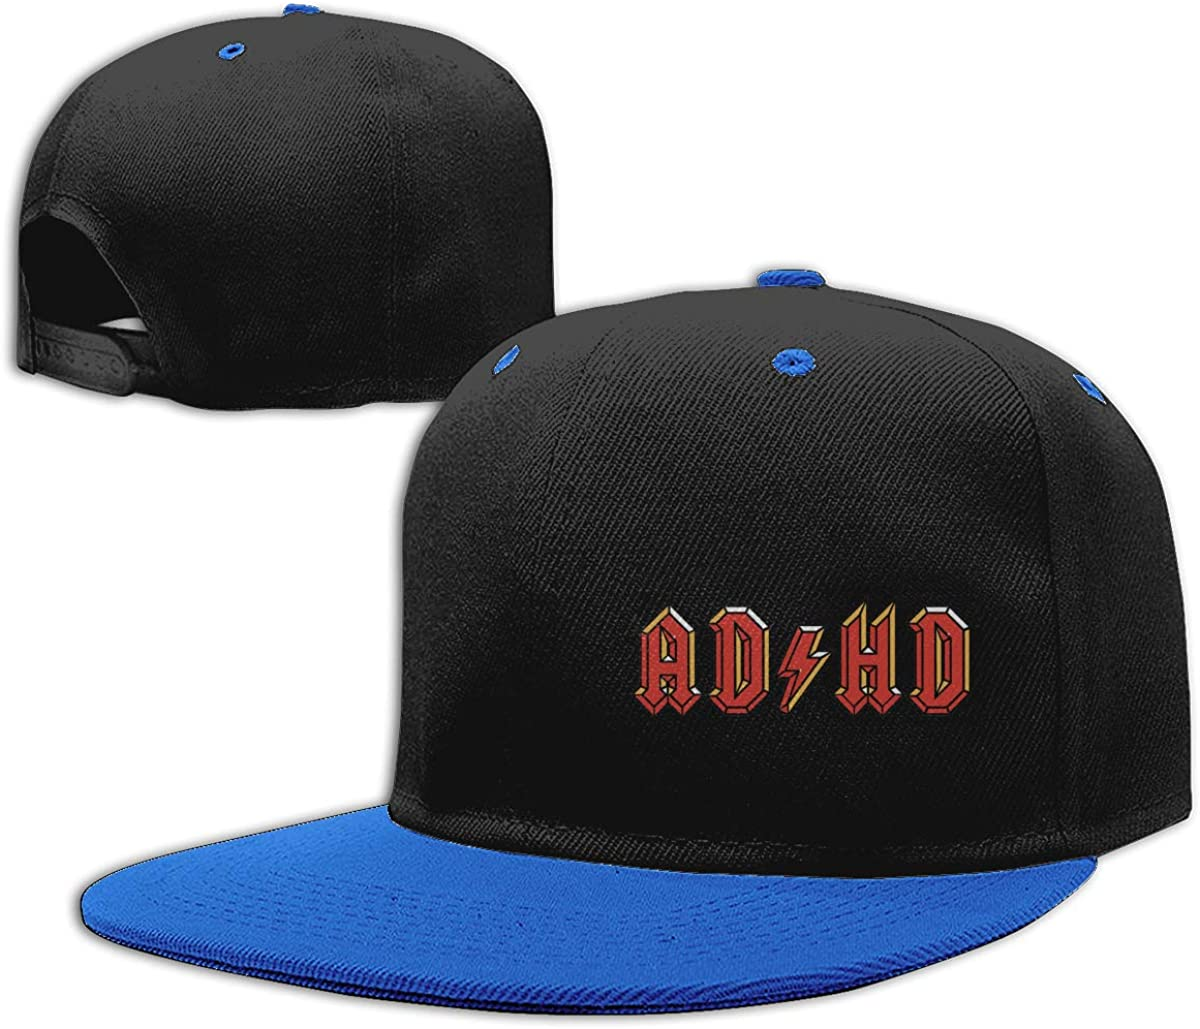 Levoncar Liunz Women/&Man Unisex with Joyner Lucas ADHD Trend Adjustable Plain Hats